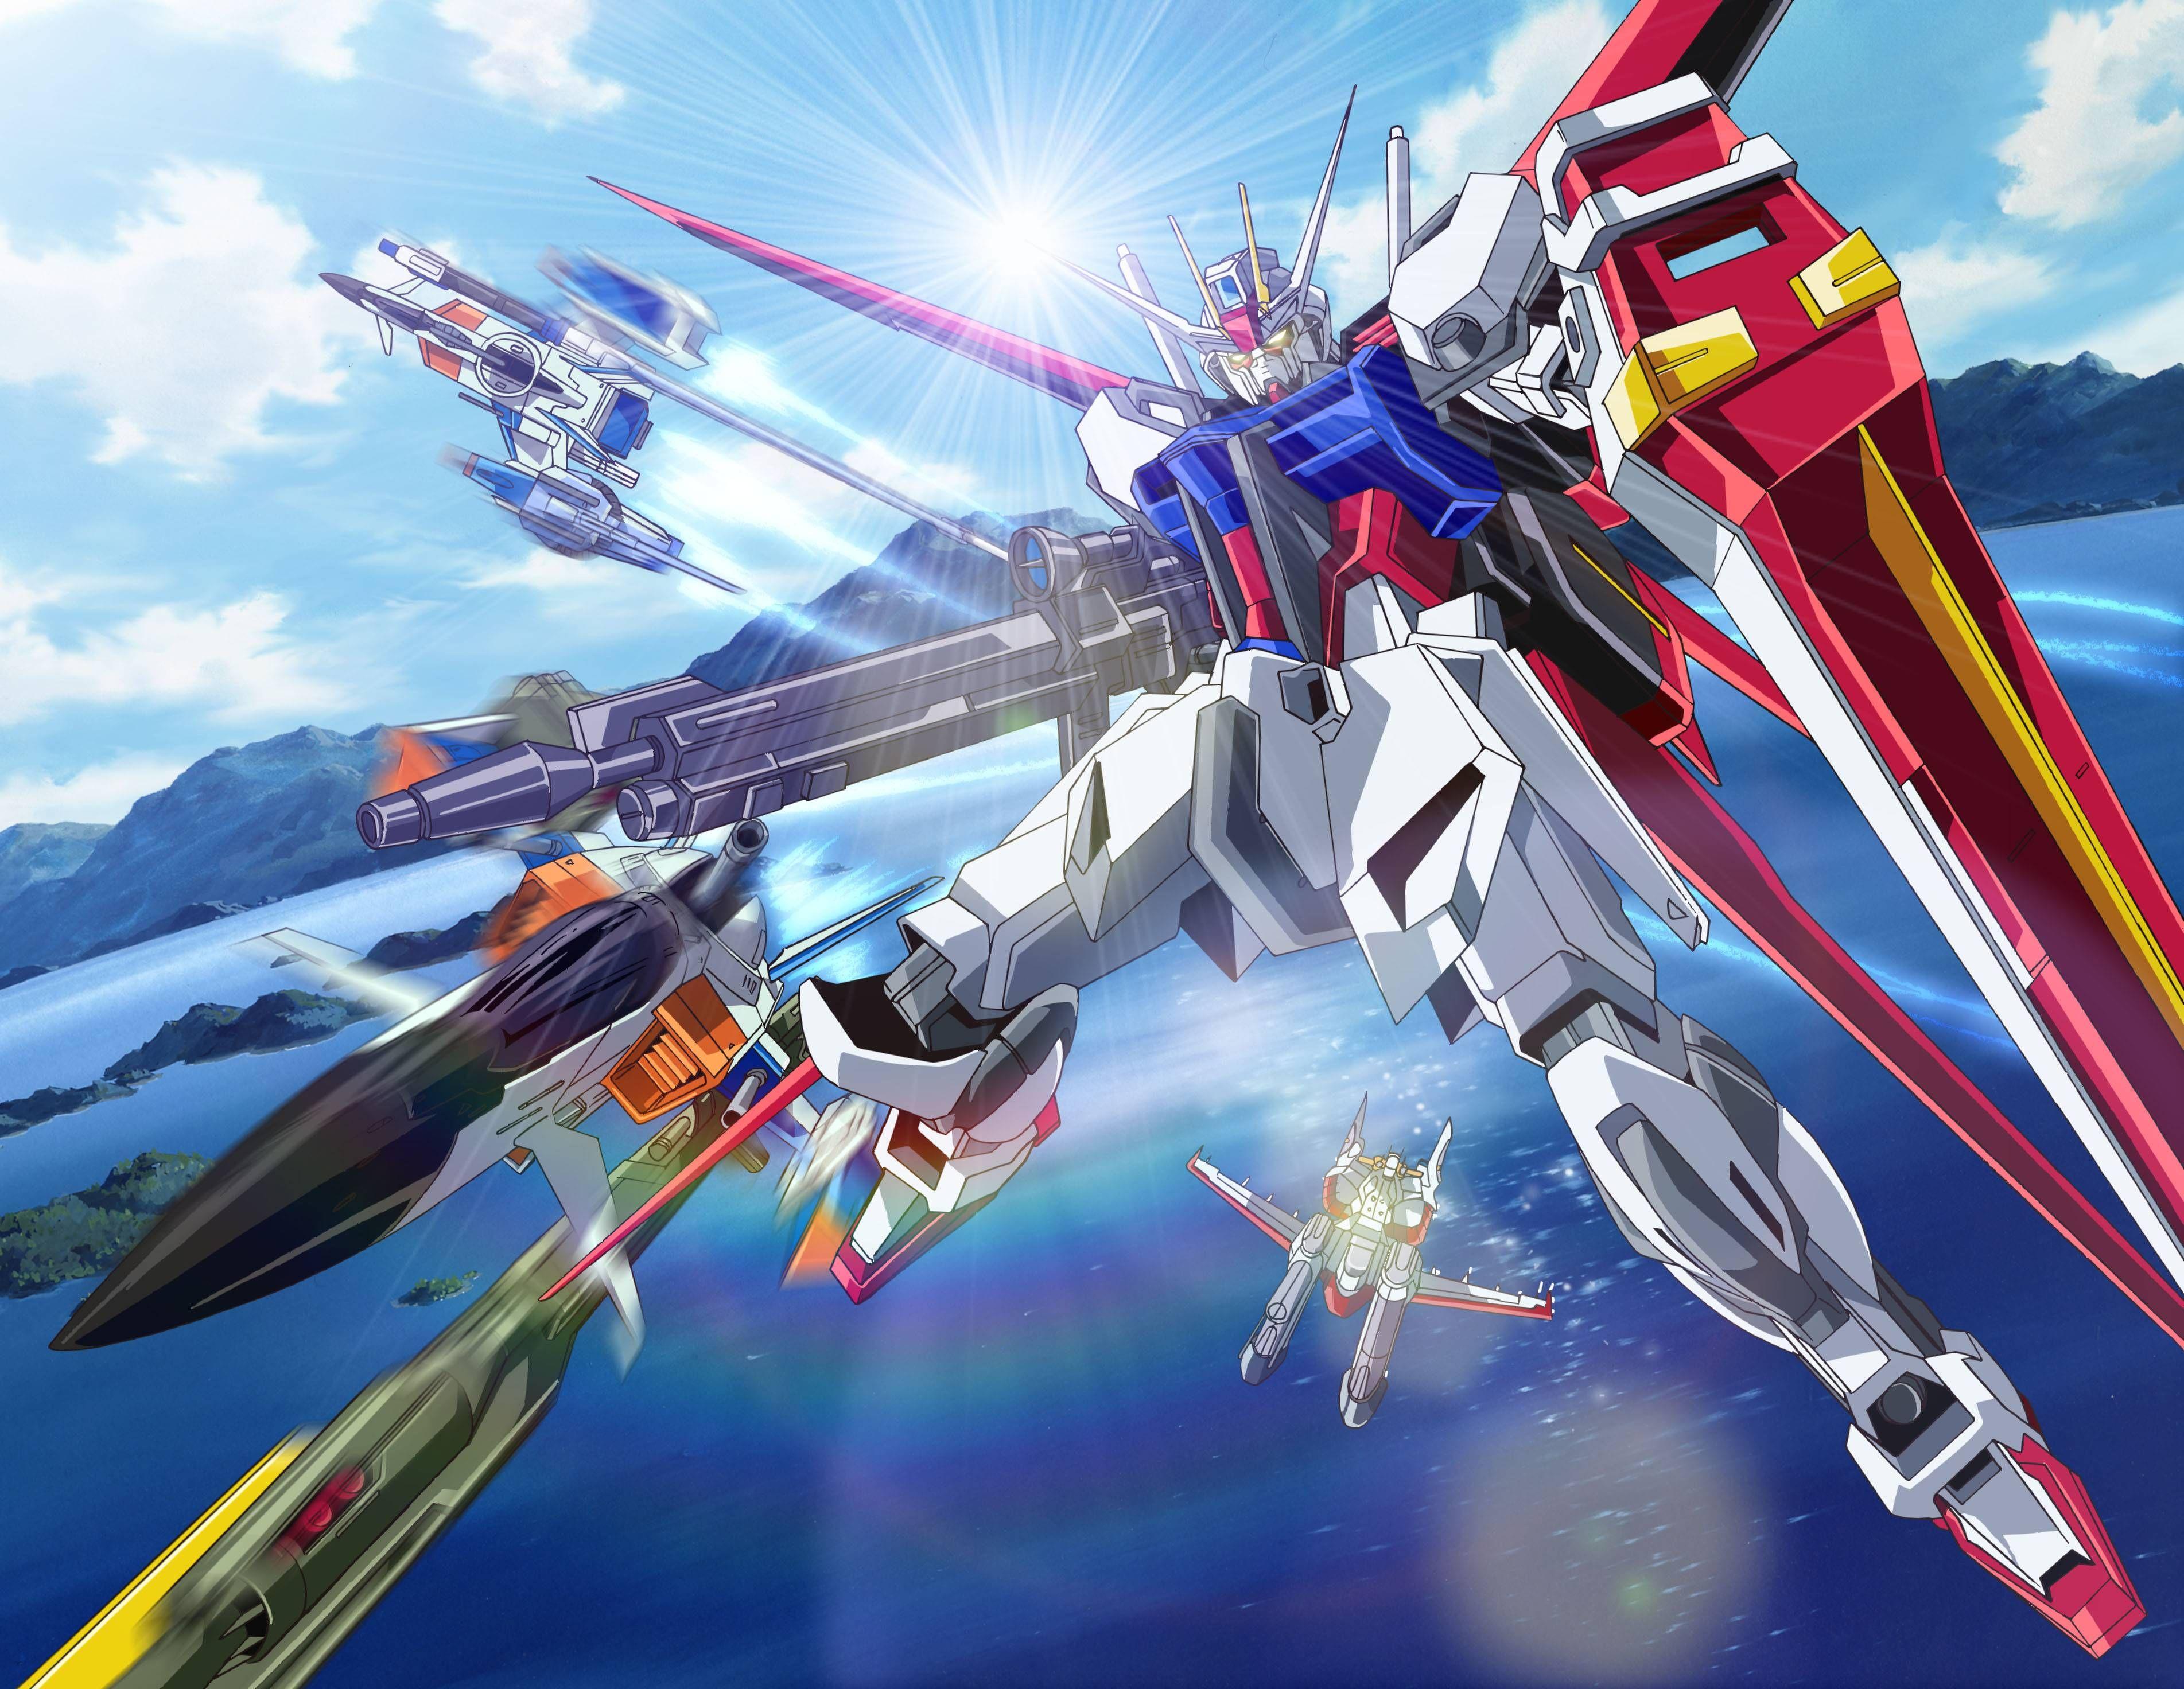 Hd Gundam Themes: Gundam Seed Wallpapers - Wallpaper Cave